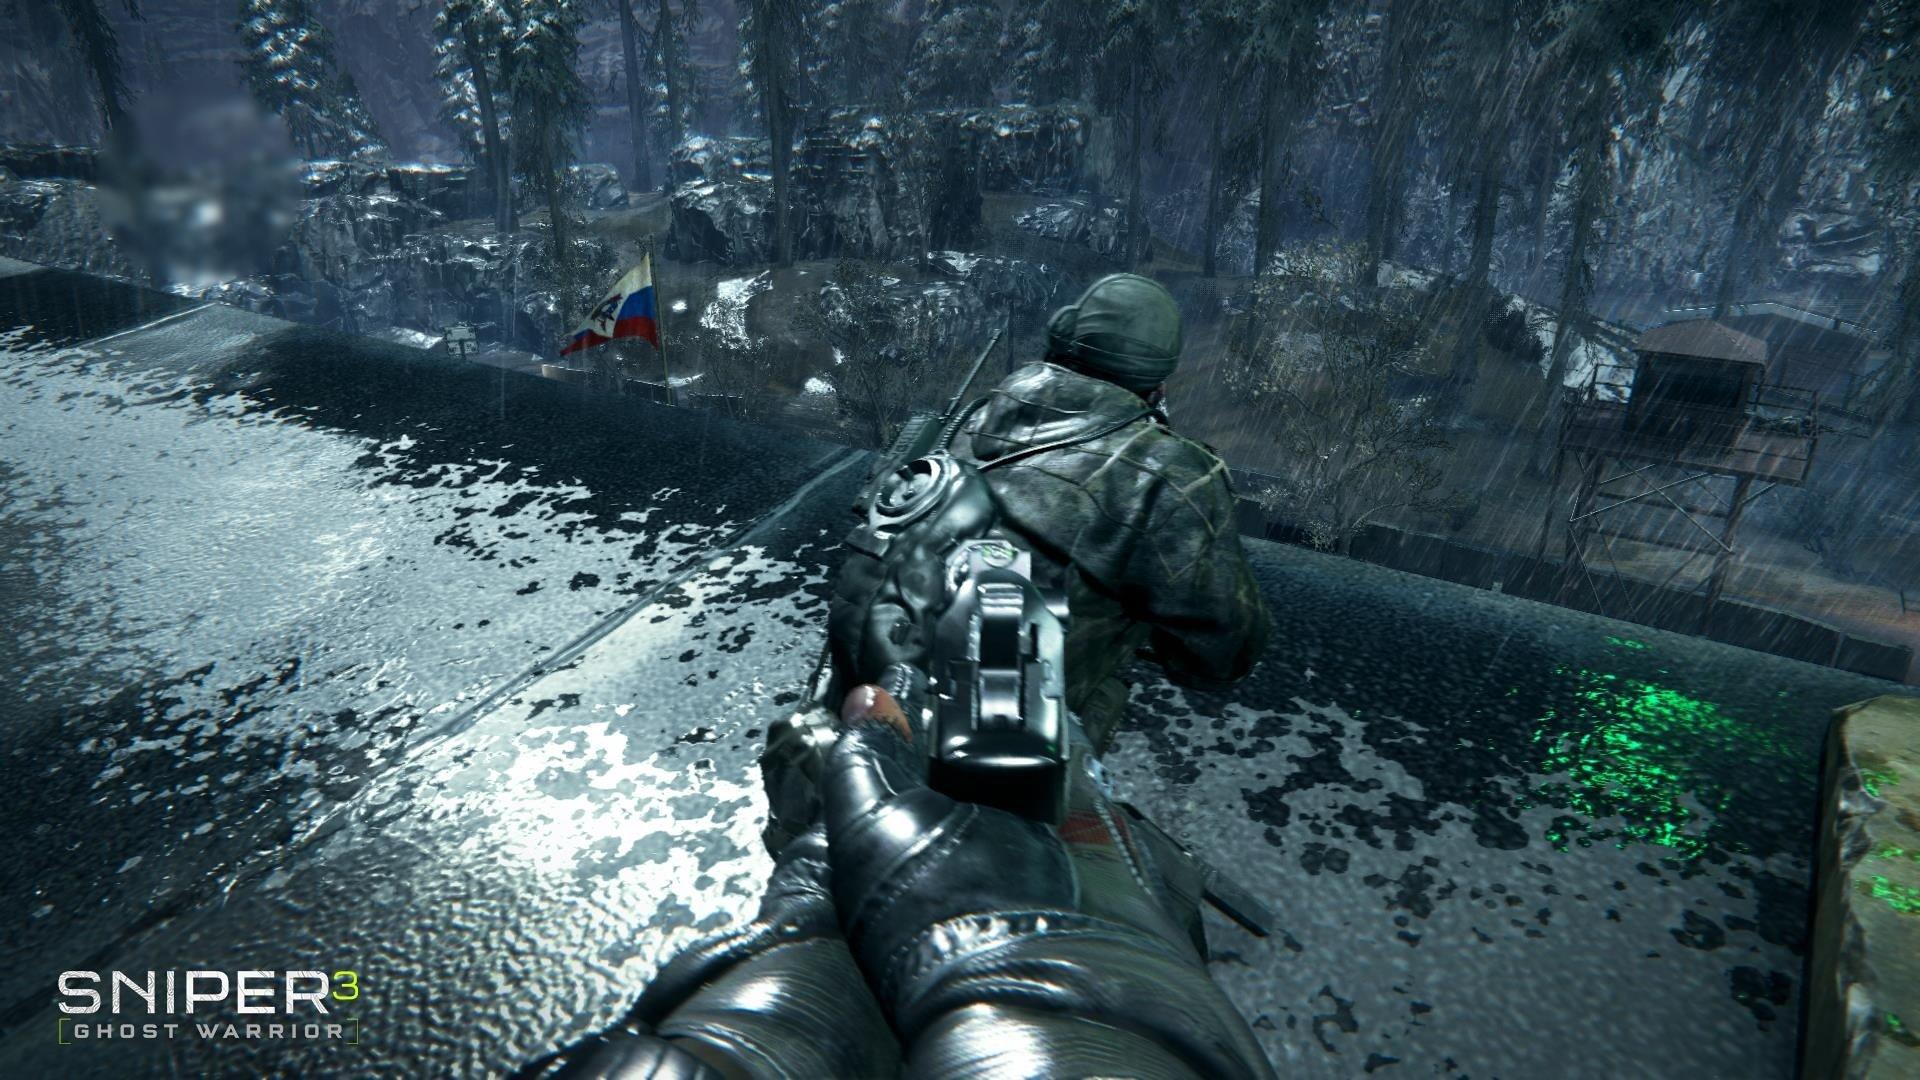 Sniper Ghost Warrior 3 Wallpapers